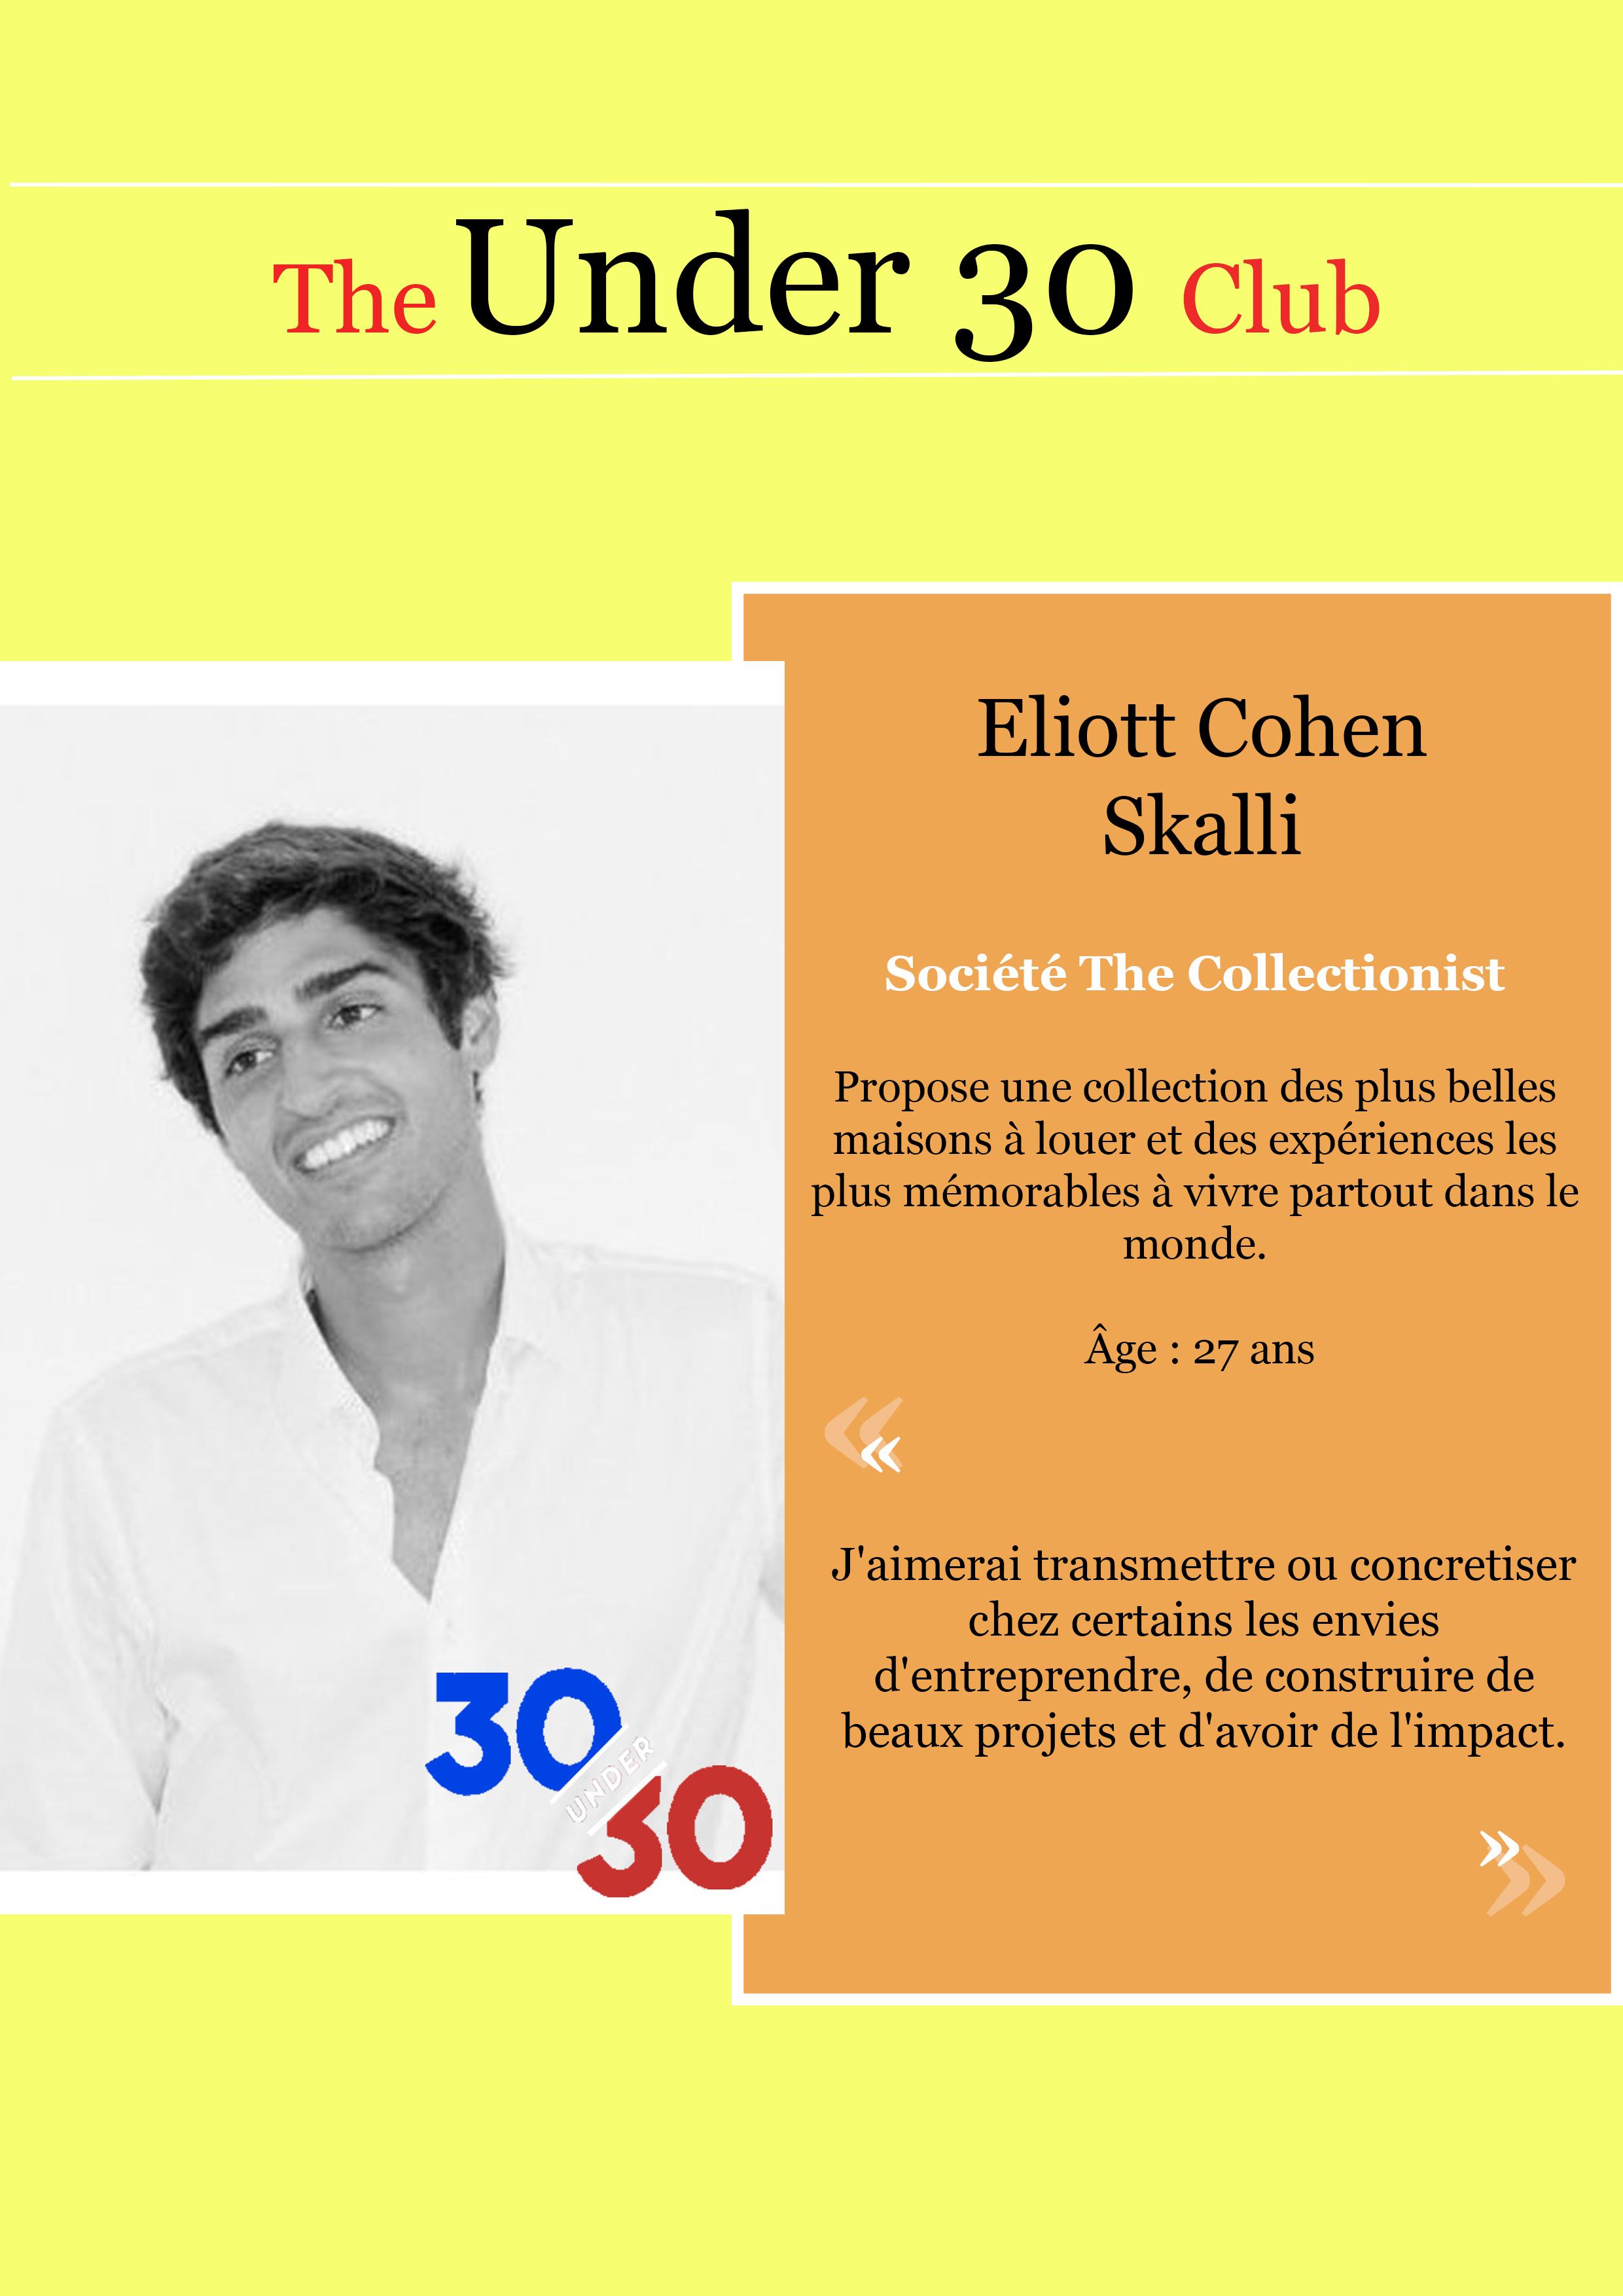 Eliott Cohen